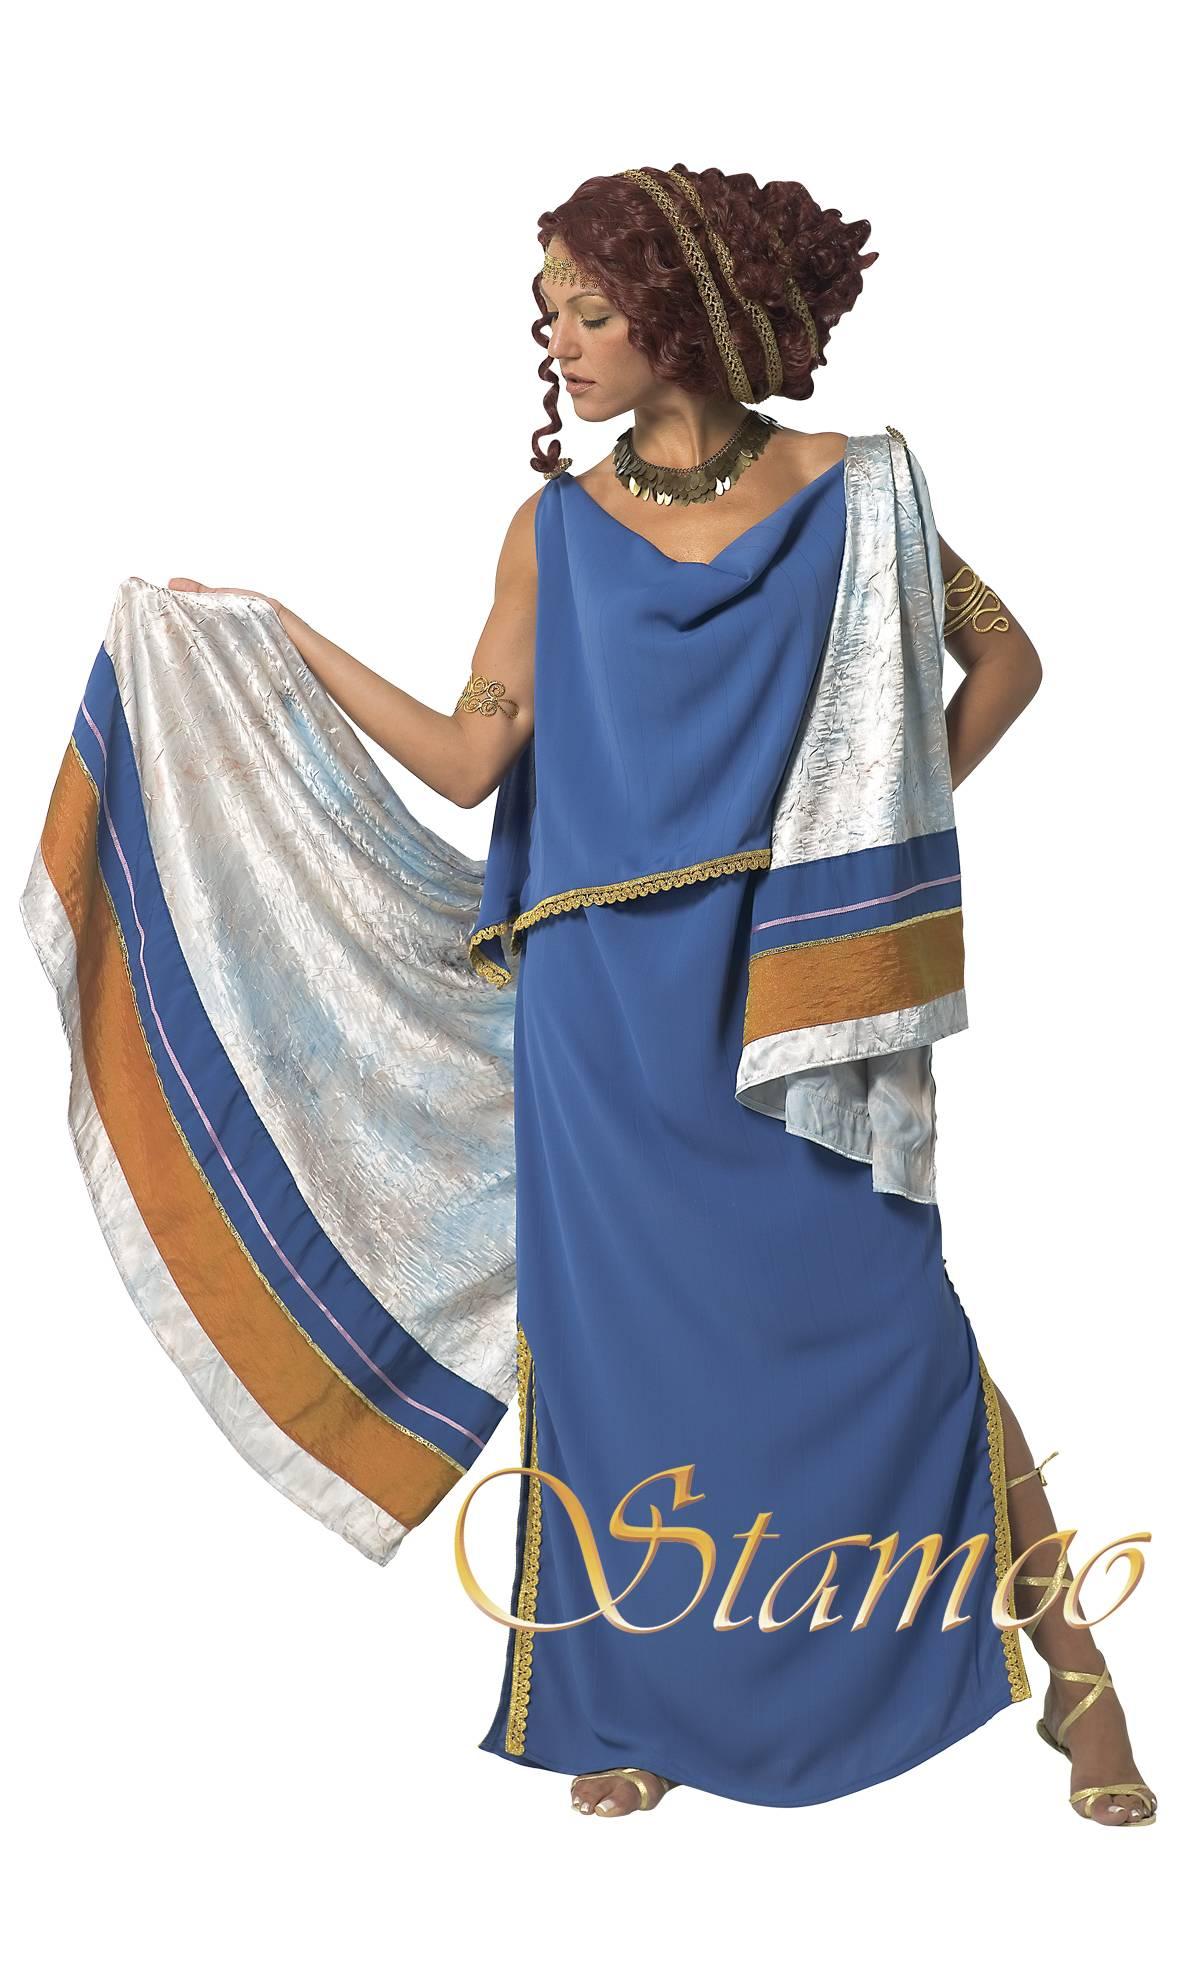 costume romaine bleue v29327. Black Bedroom Furniture Sets. Home Design Ideas